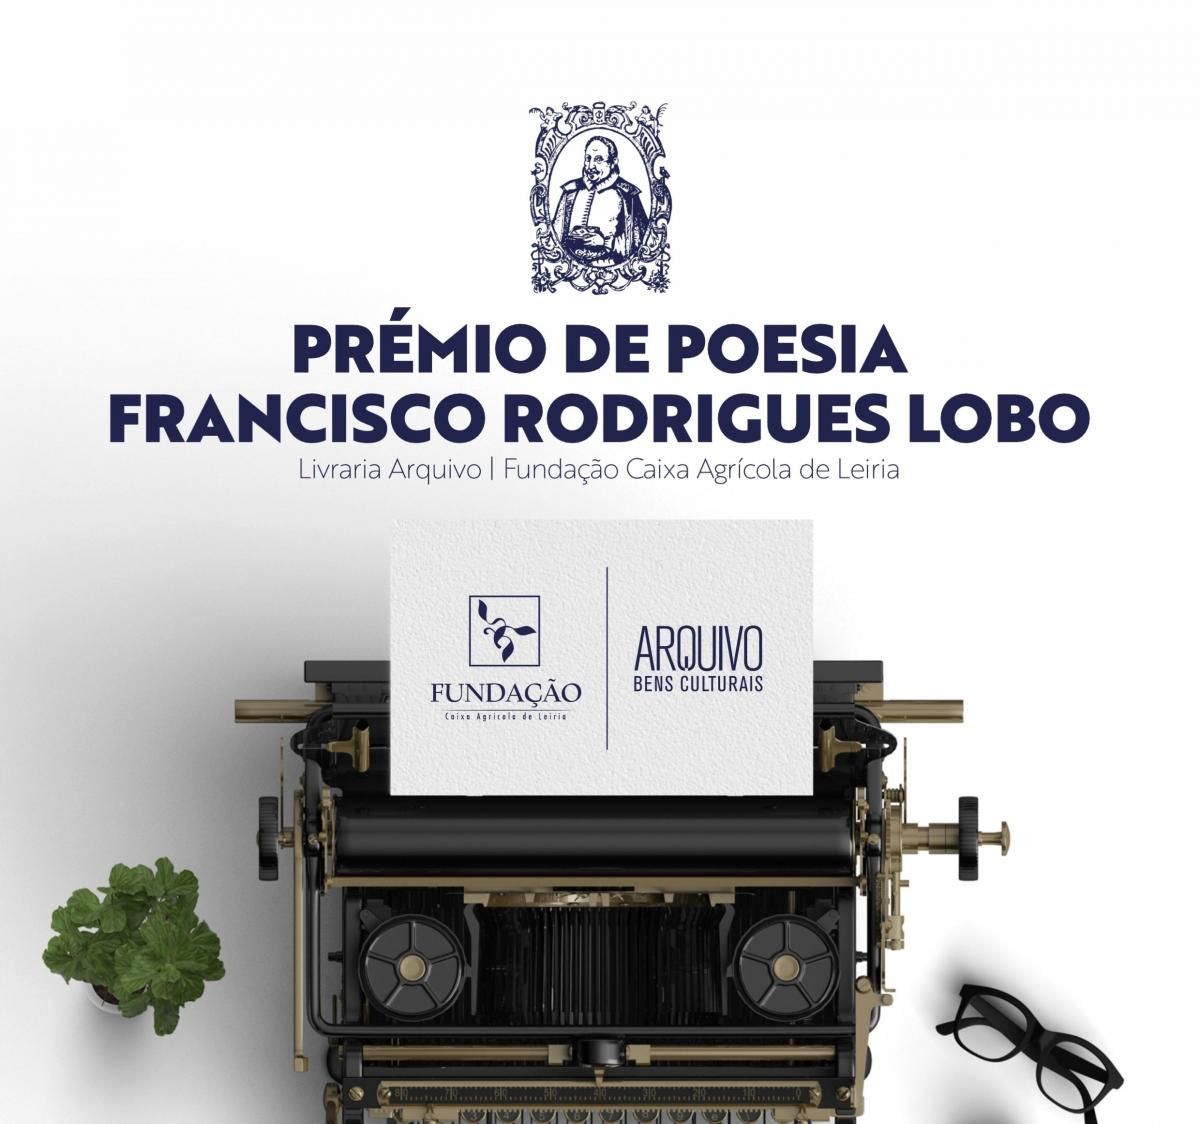 Prémio de Poesia evoca Rodrigues Lobo